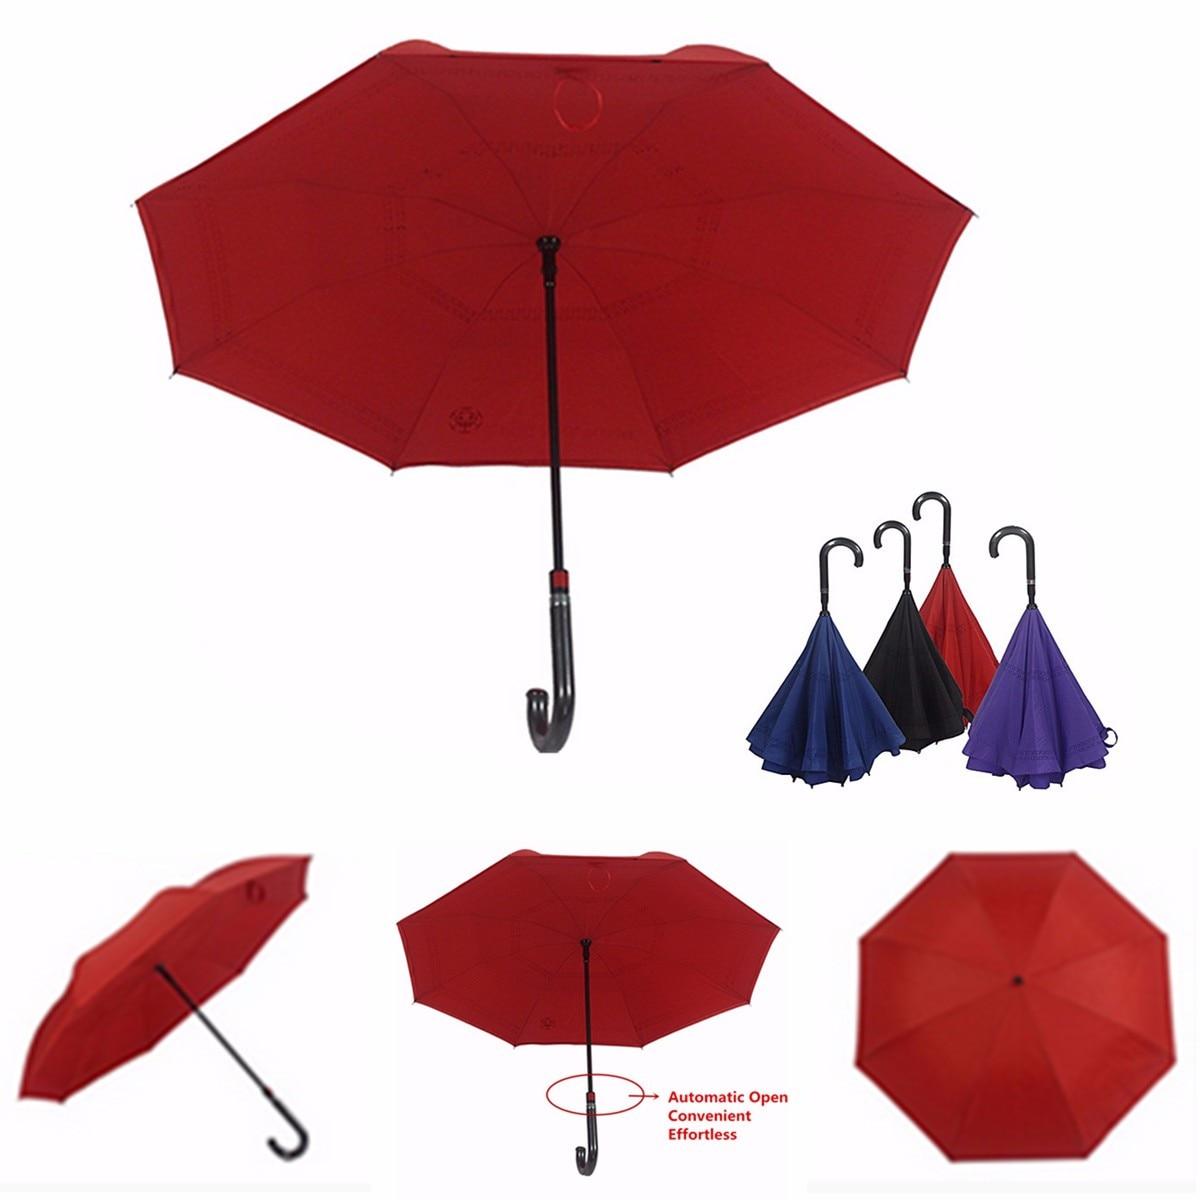 Invert color jpg online - Anti Uv Upside Down Reverse Umbrella Inverted Double Layer Umbrella Reverse Design Umbrella Windproof Parasol Bumbershoot